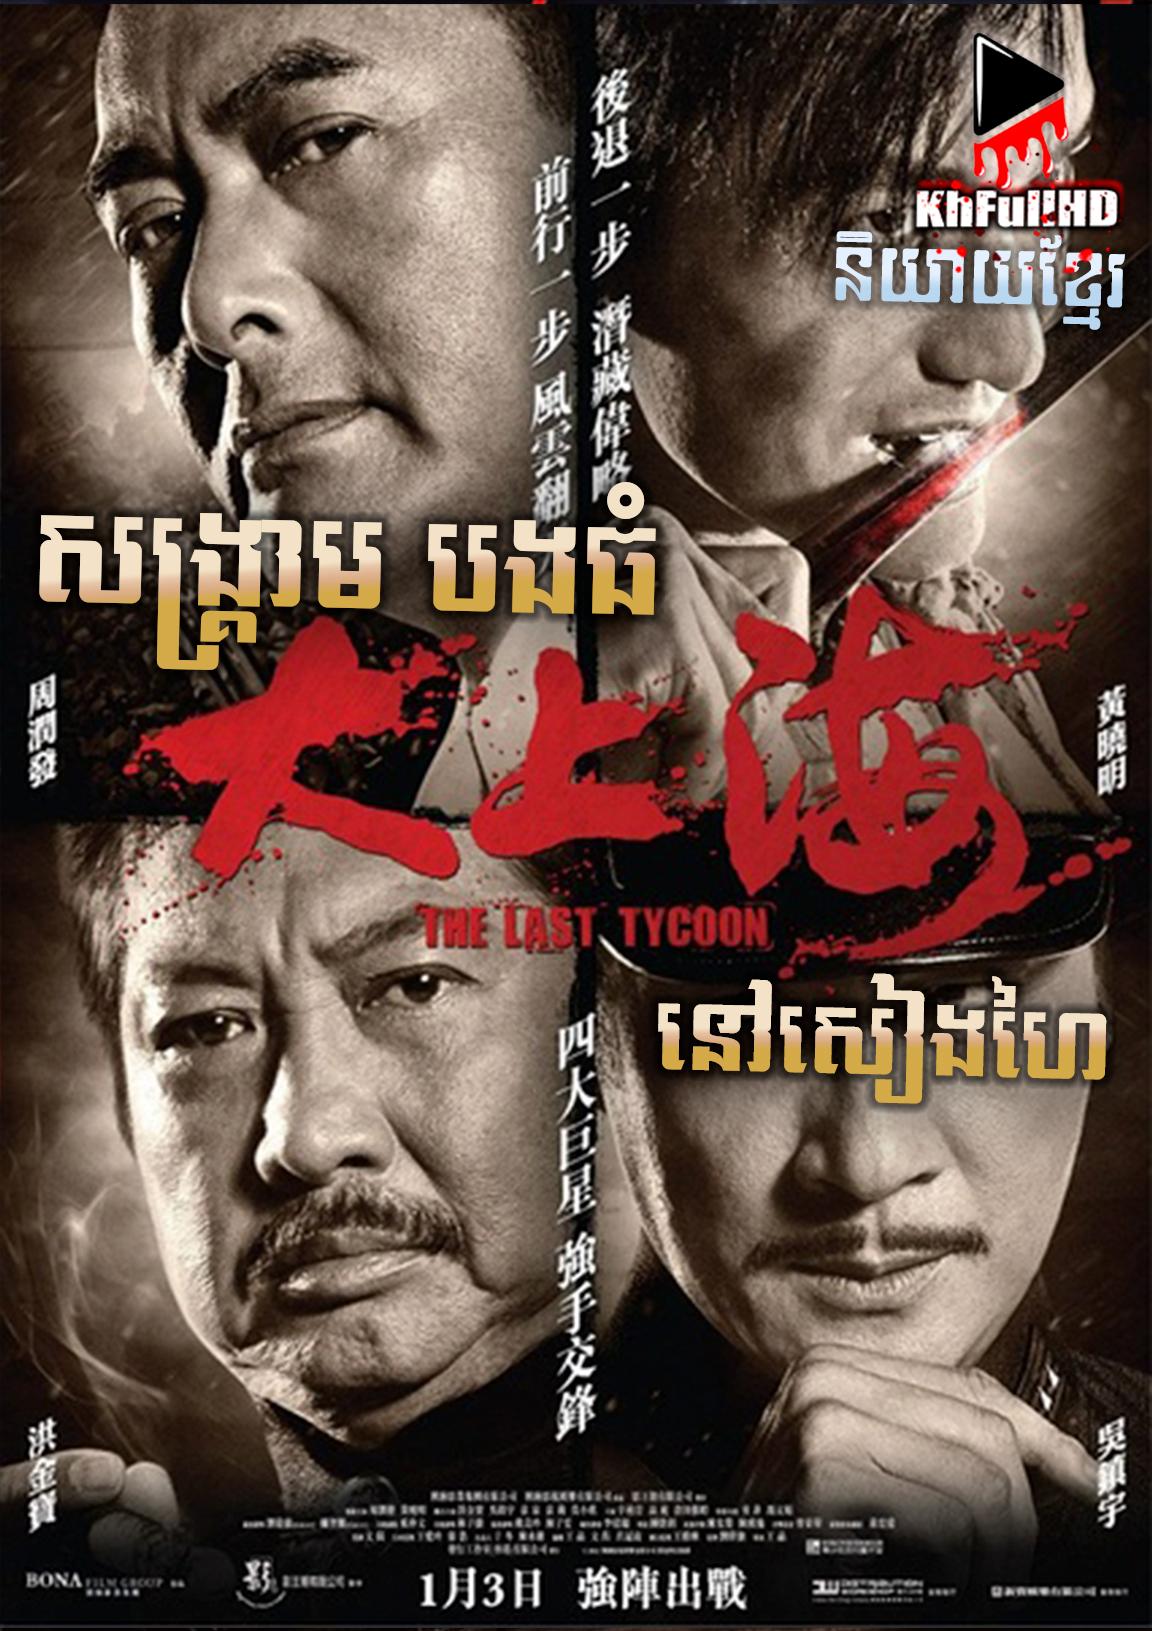 The Last Tycoon-សង្គ្រៀមបងធំនៅសៀងហៃ (2012)